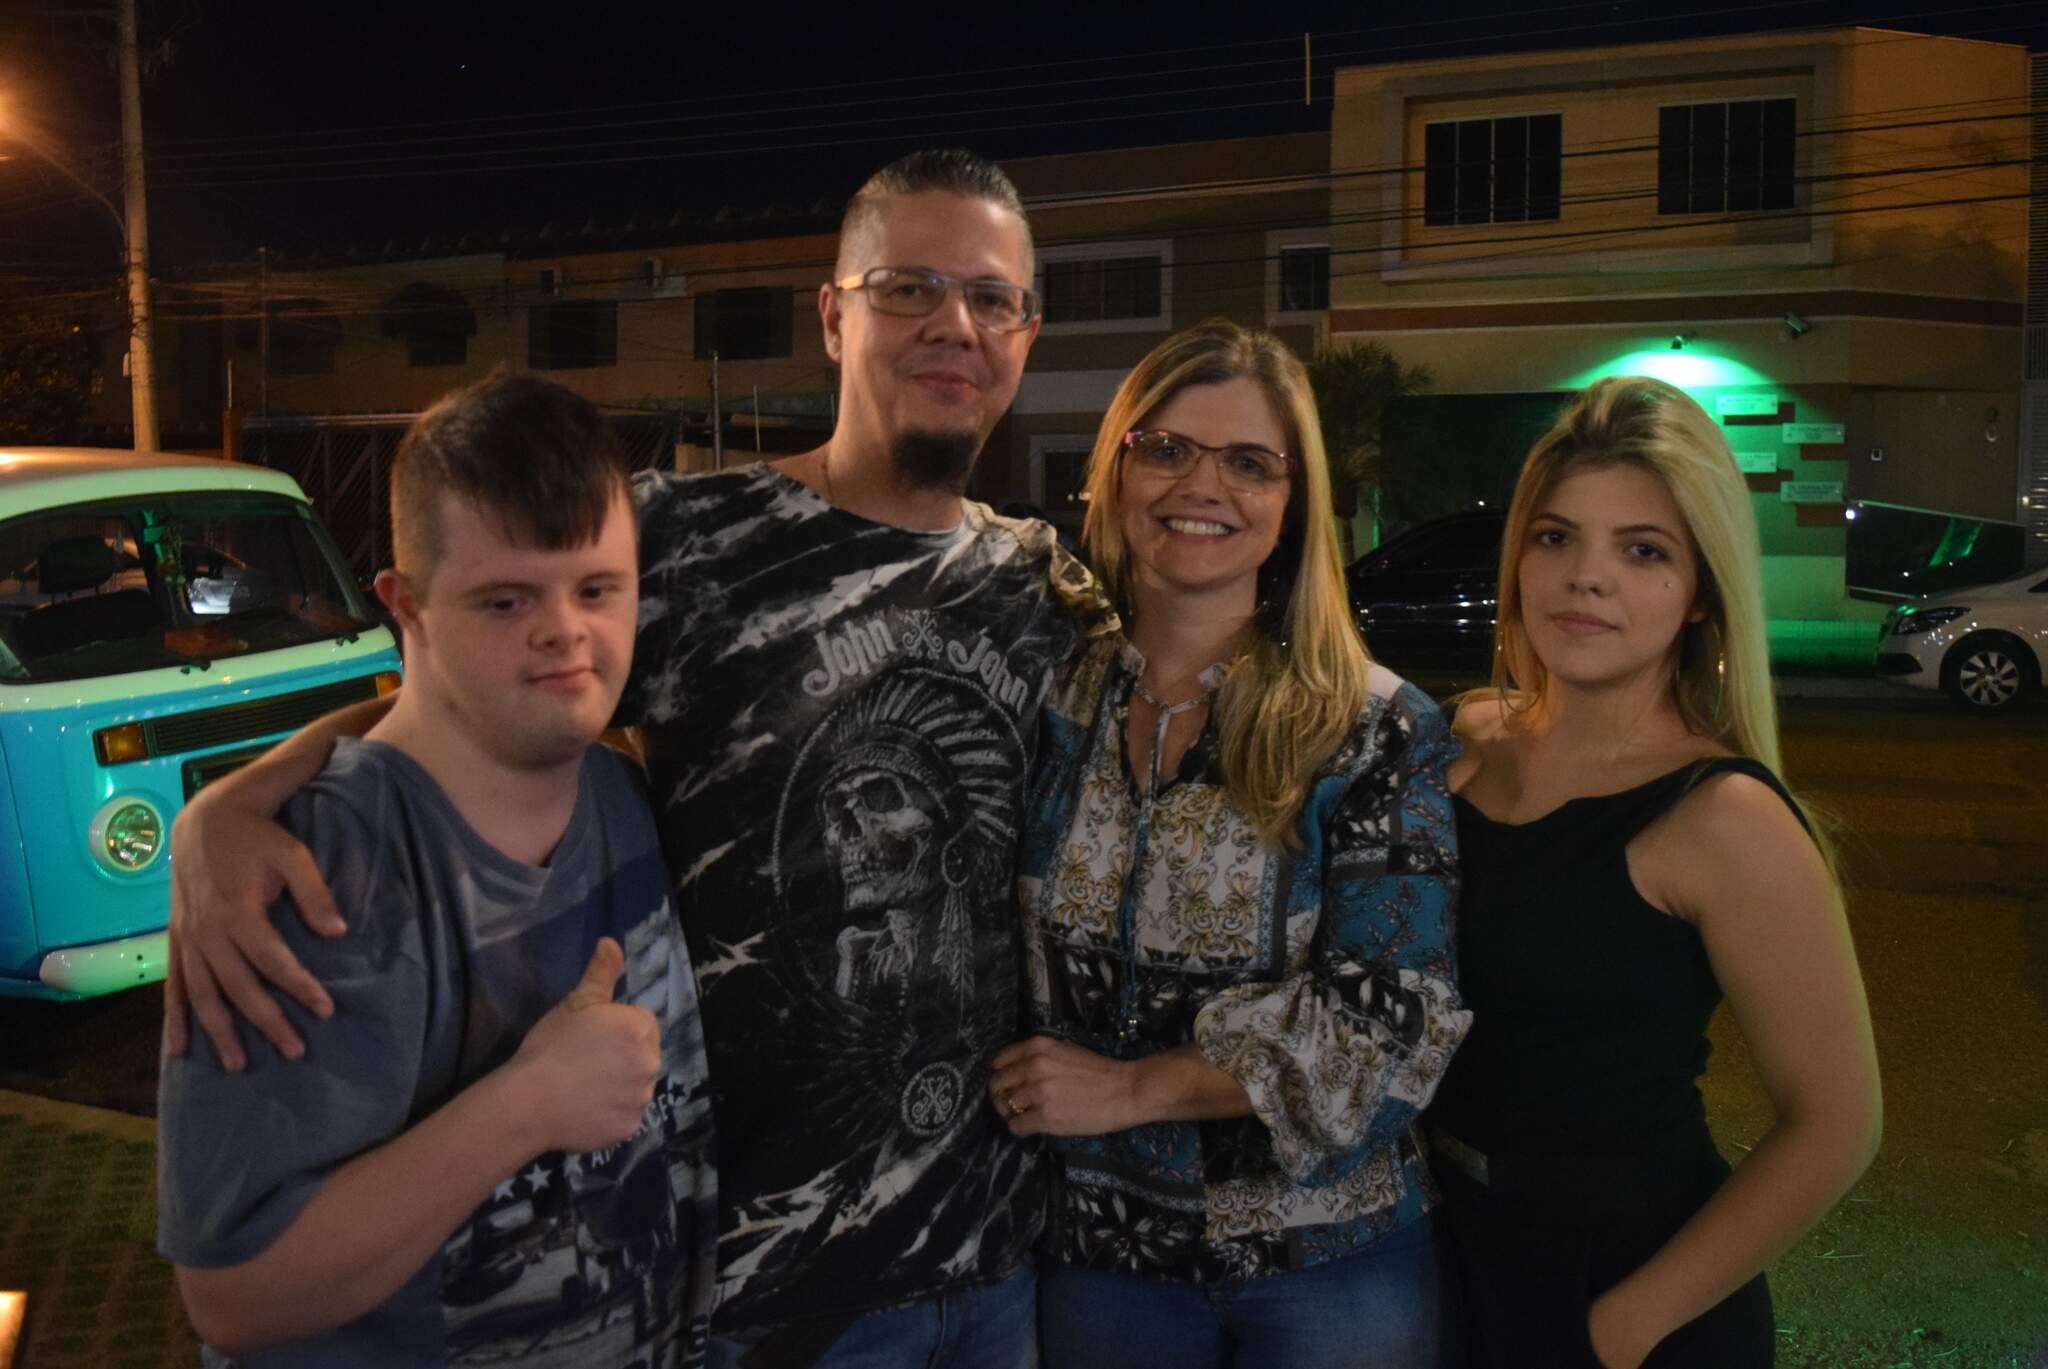 Com a família. Buga ao lado do pai Hemerson Pistori, da mãe Melissa Gindri Bragato Pistori e da irmã Julia Gindri Bragato Pistori. (Foto: Arquivo pessoal)